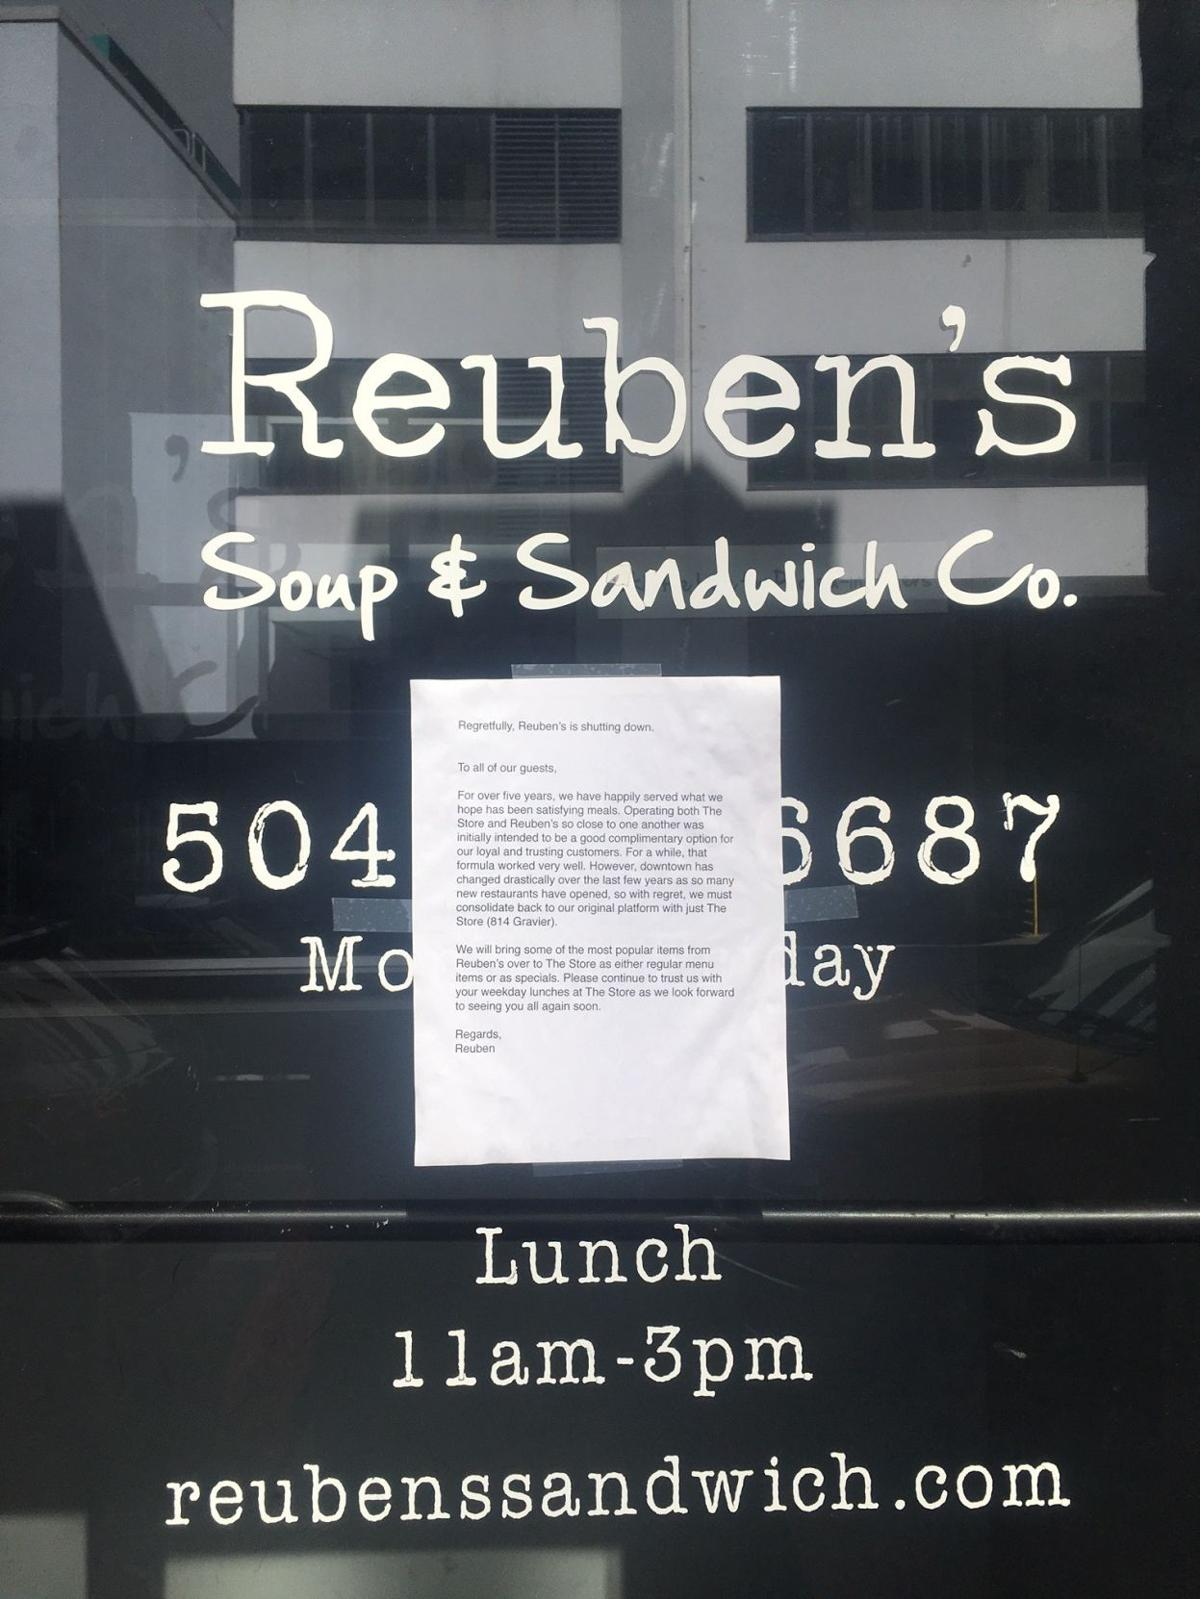 Reuben's Soup and Sandwich Co. closes_lowres